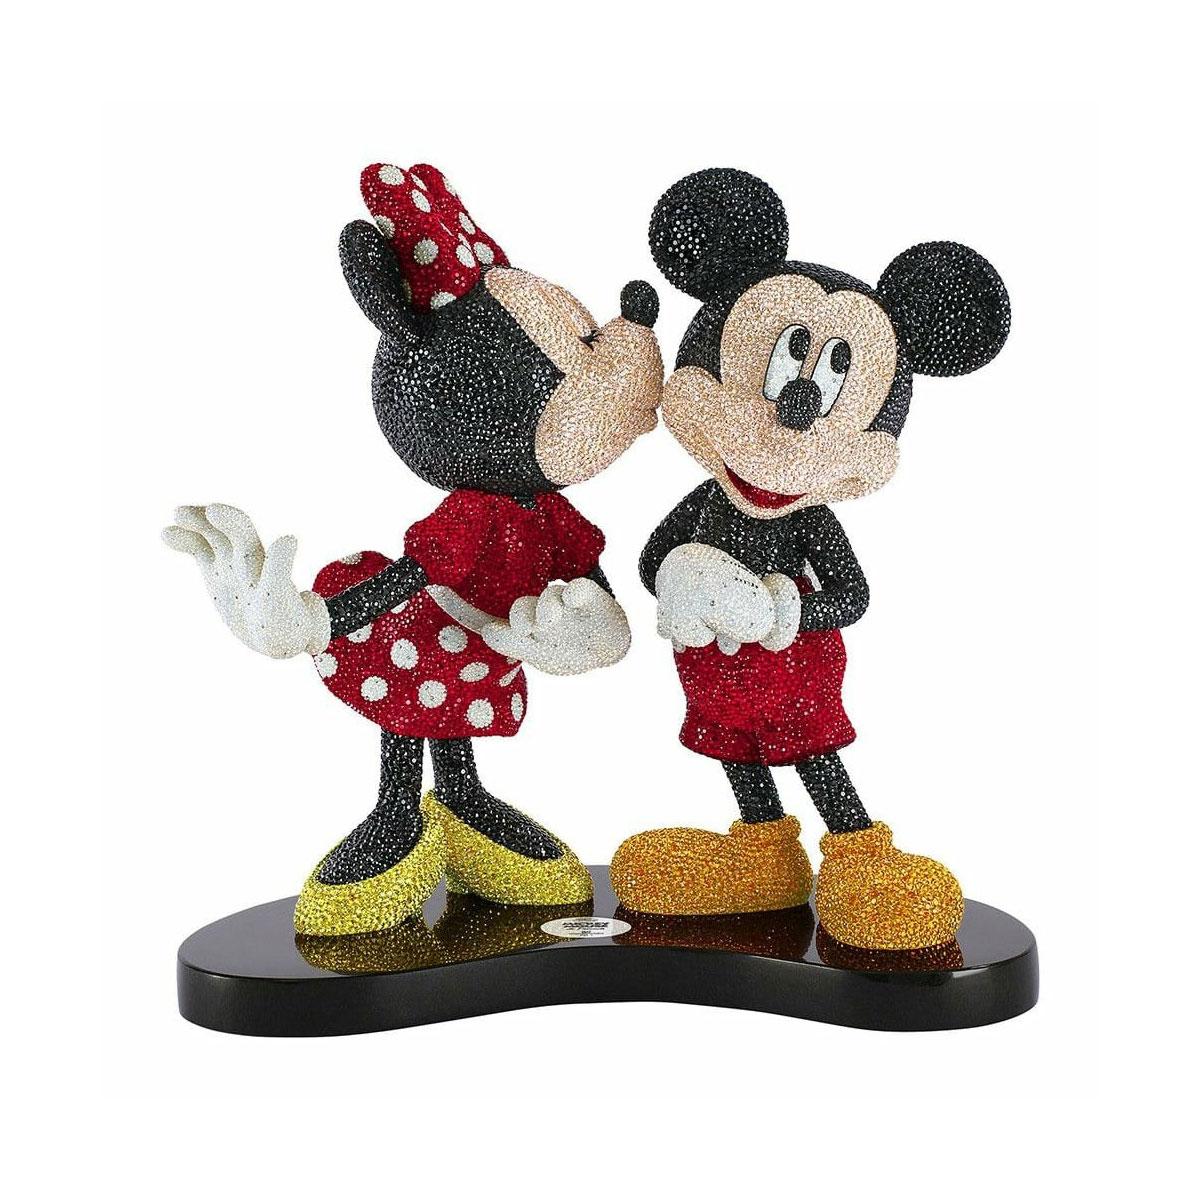 Swarovski Myriad Mickey and Minnie, Limited Edition